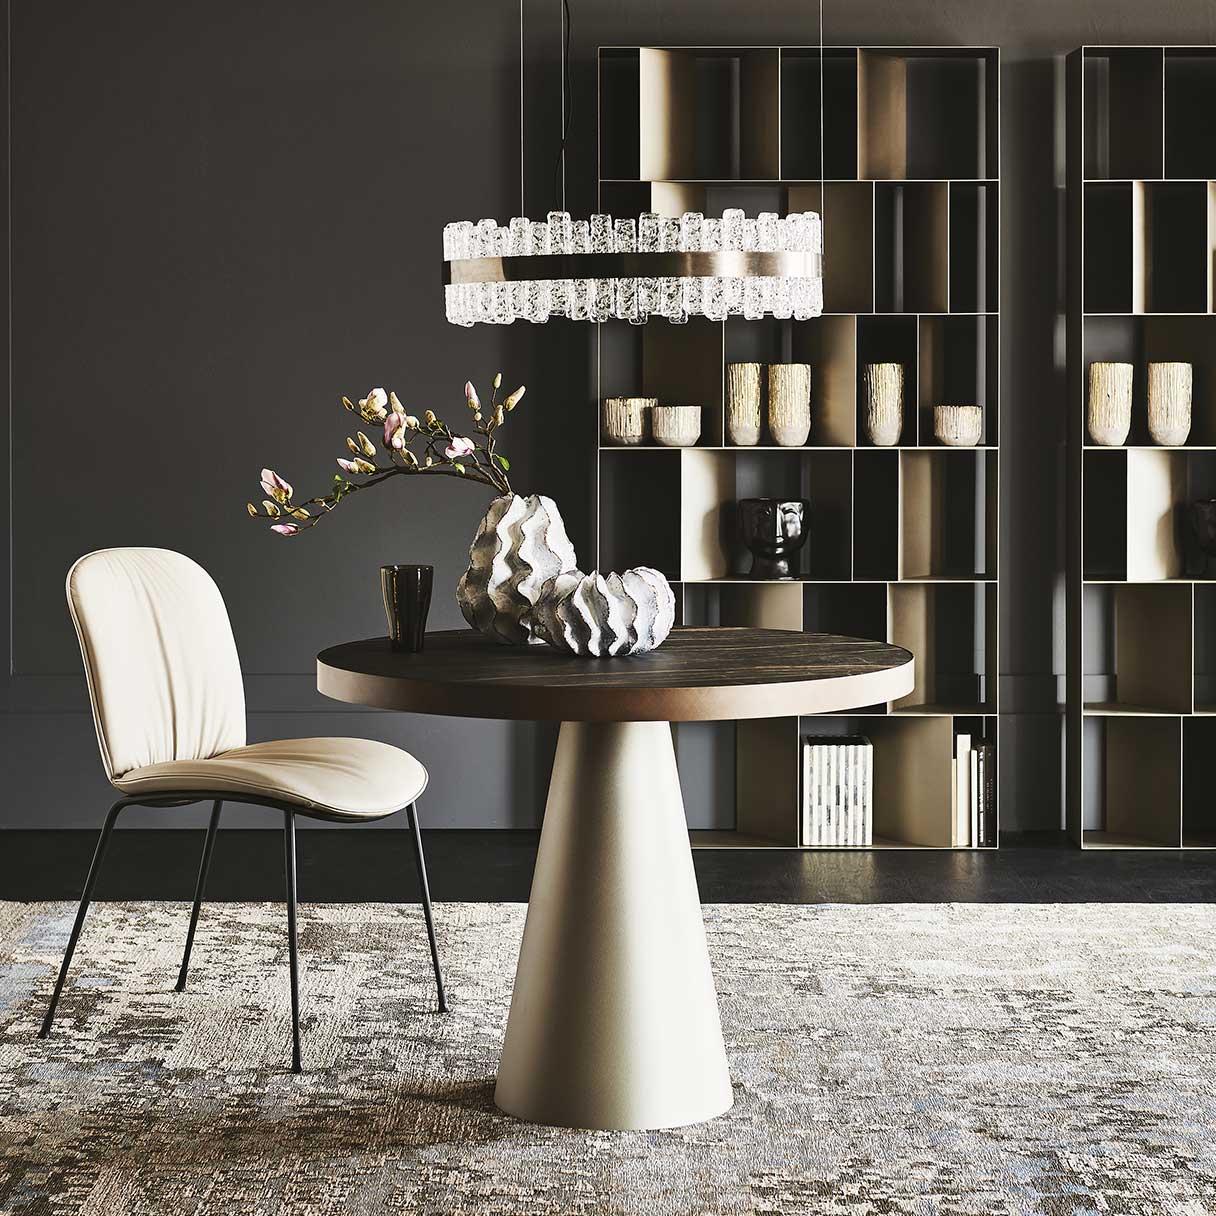 Saturno Keramik Bistro Table, Tina Chair, Phoenix Ceiling Lamp by Cattelan Italia